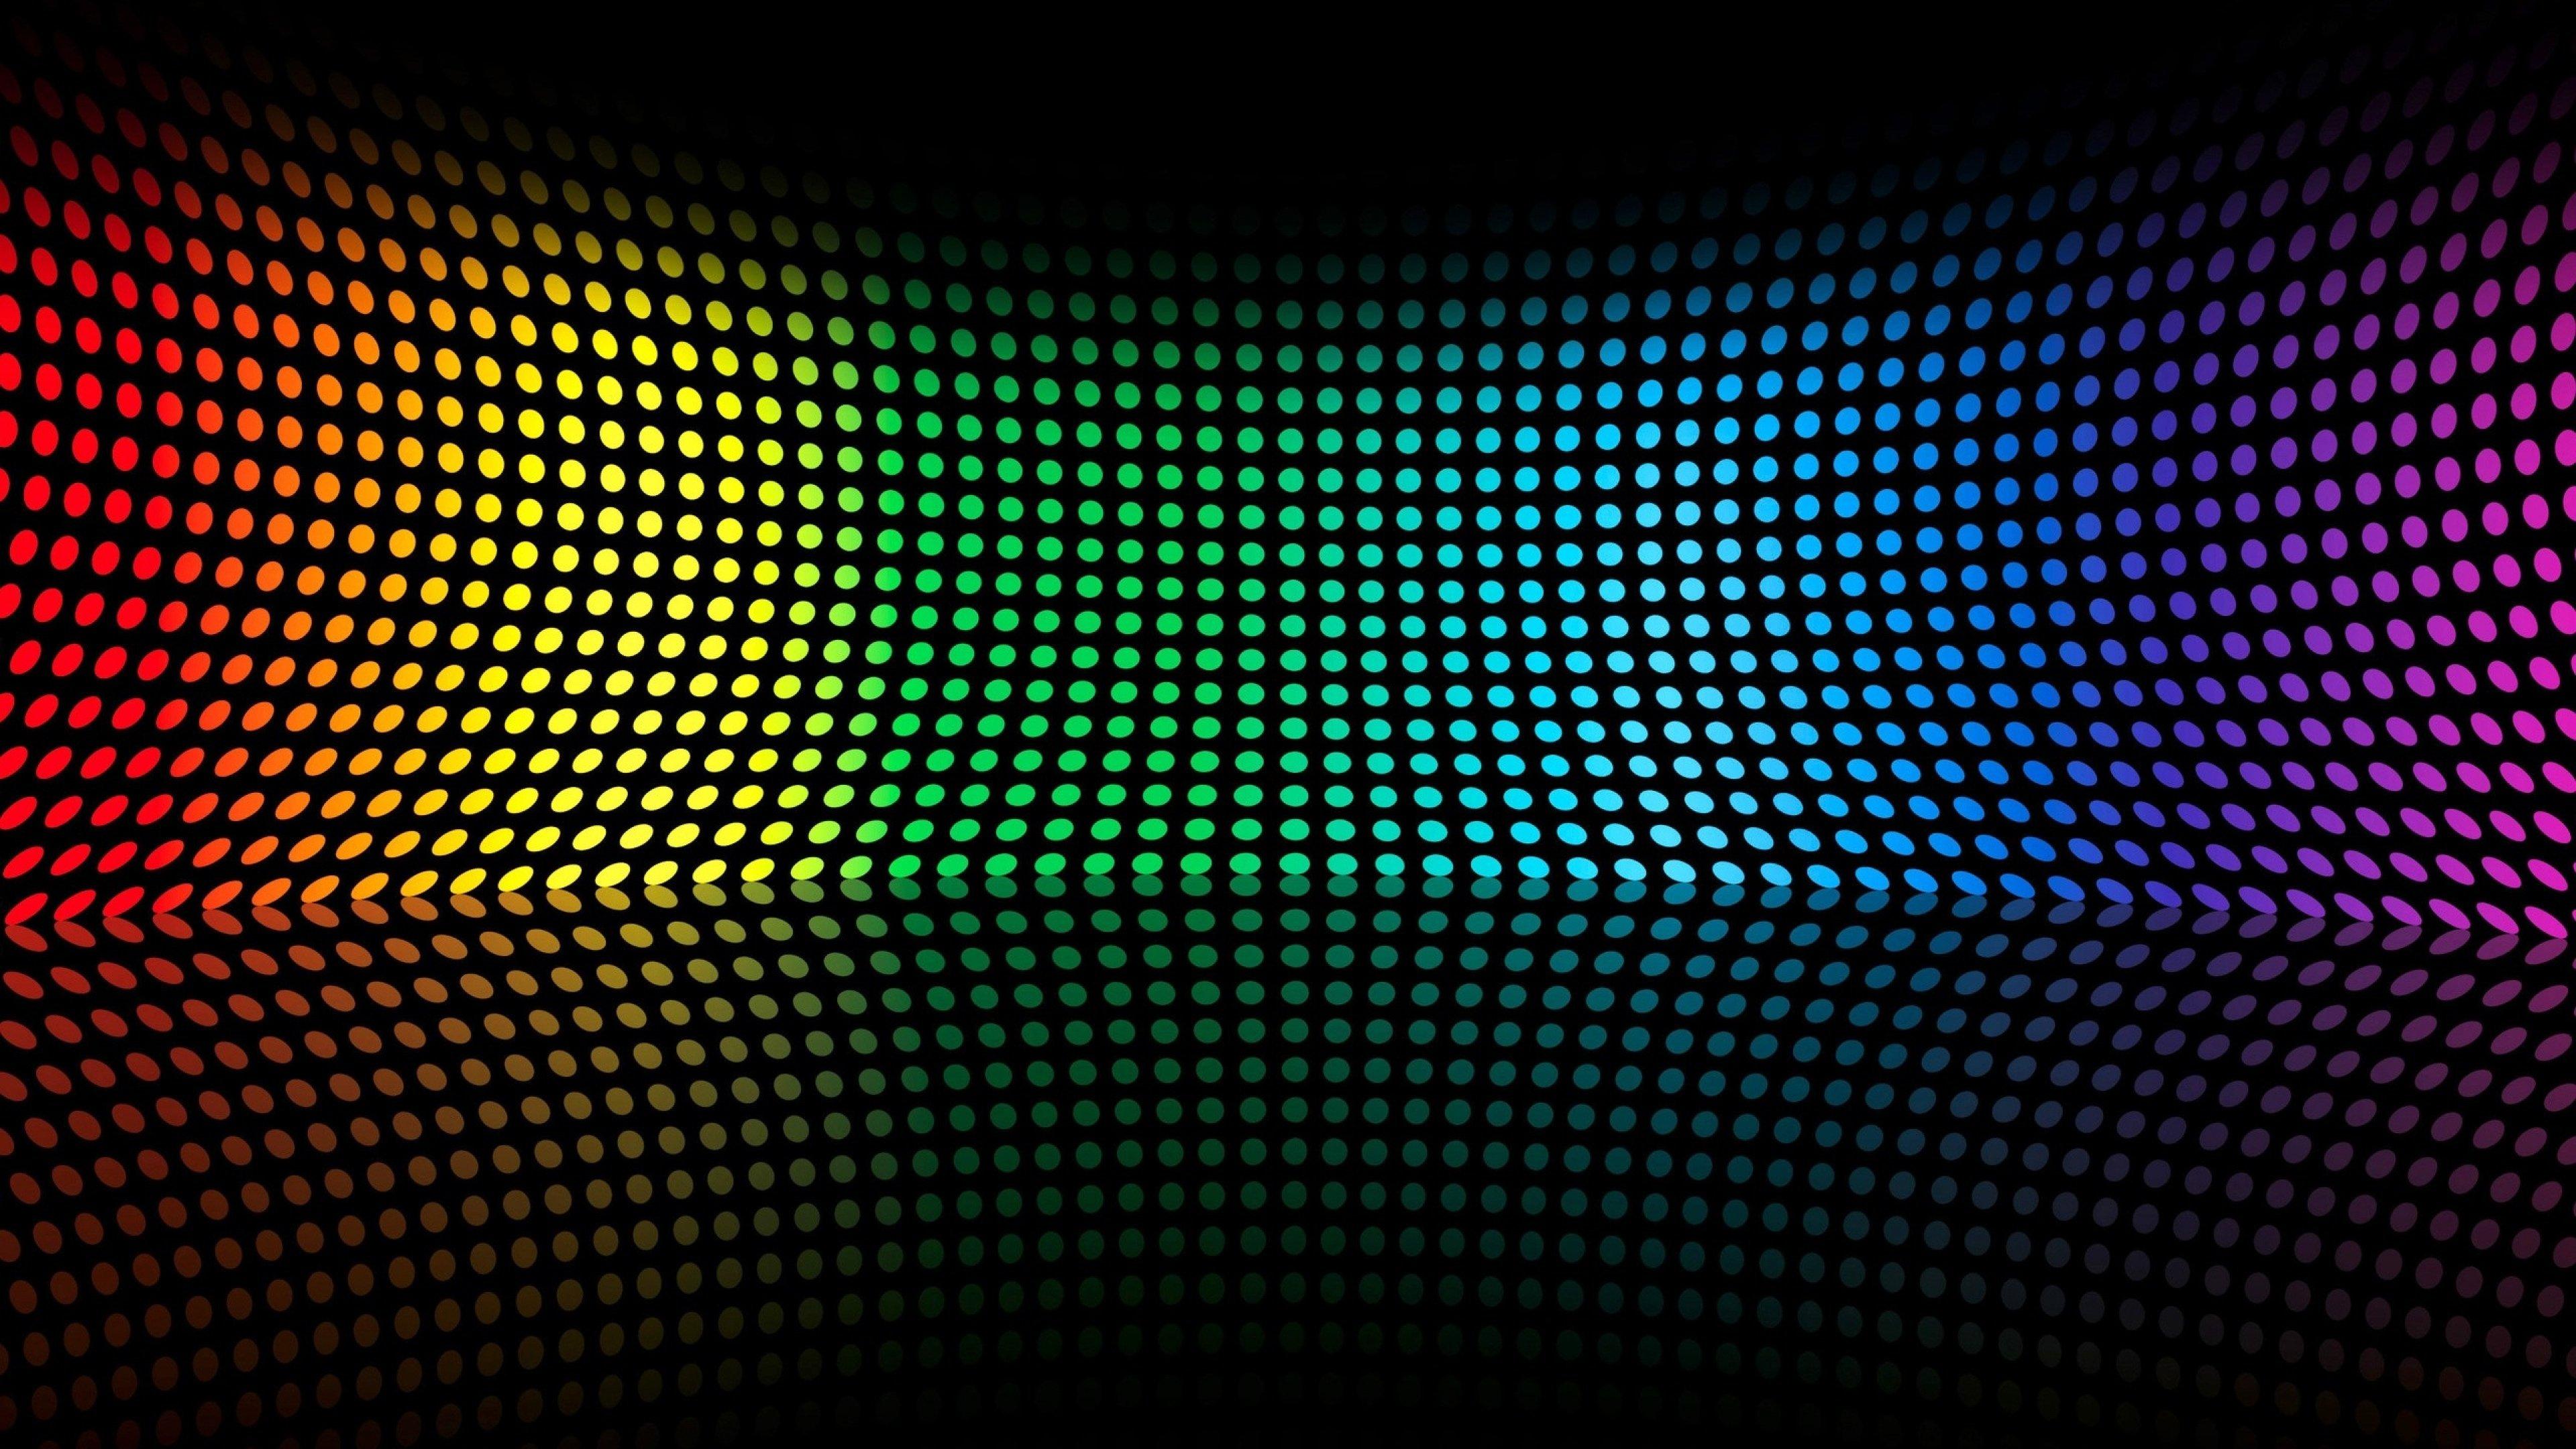 hd desktop wallpapers 2048x1152 - photo #30